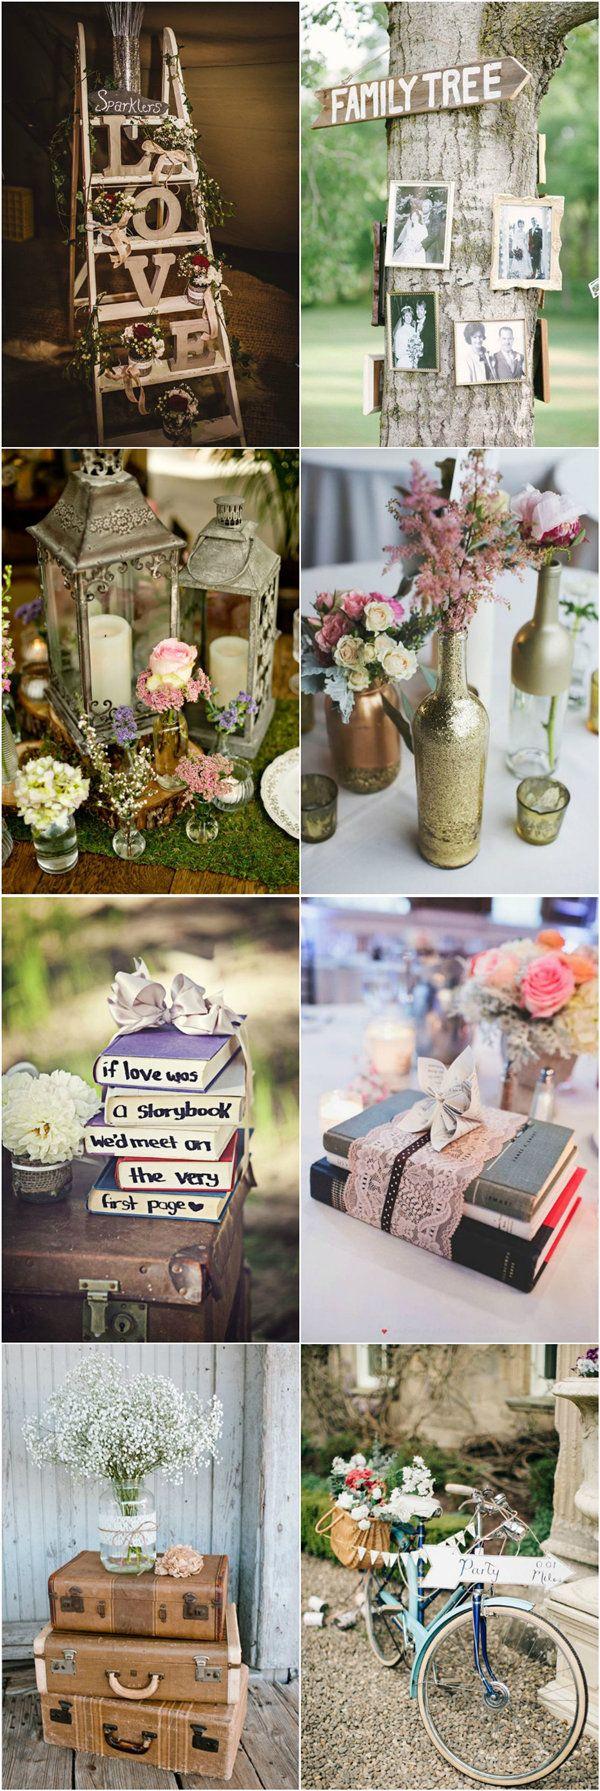 Wedding ideas spring   Stunning Vintage Wedding Ideas For SpringSummer  Wedding Deko